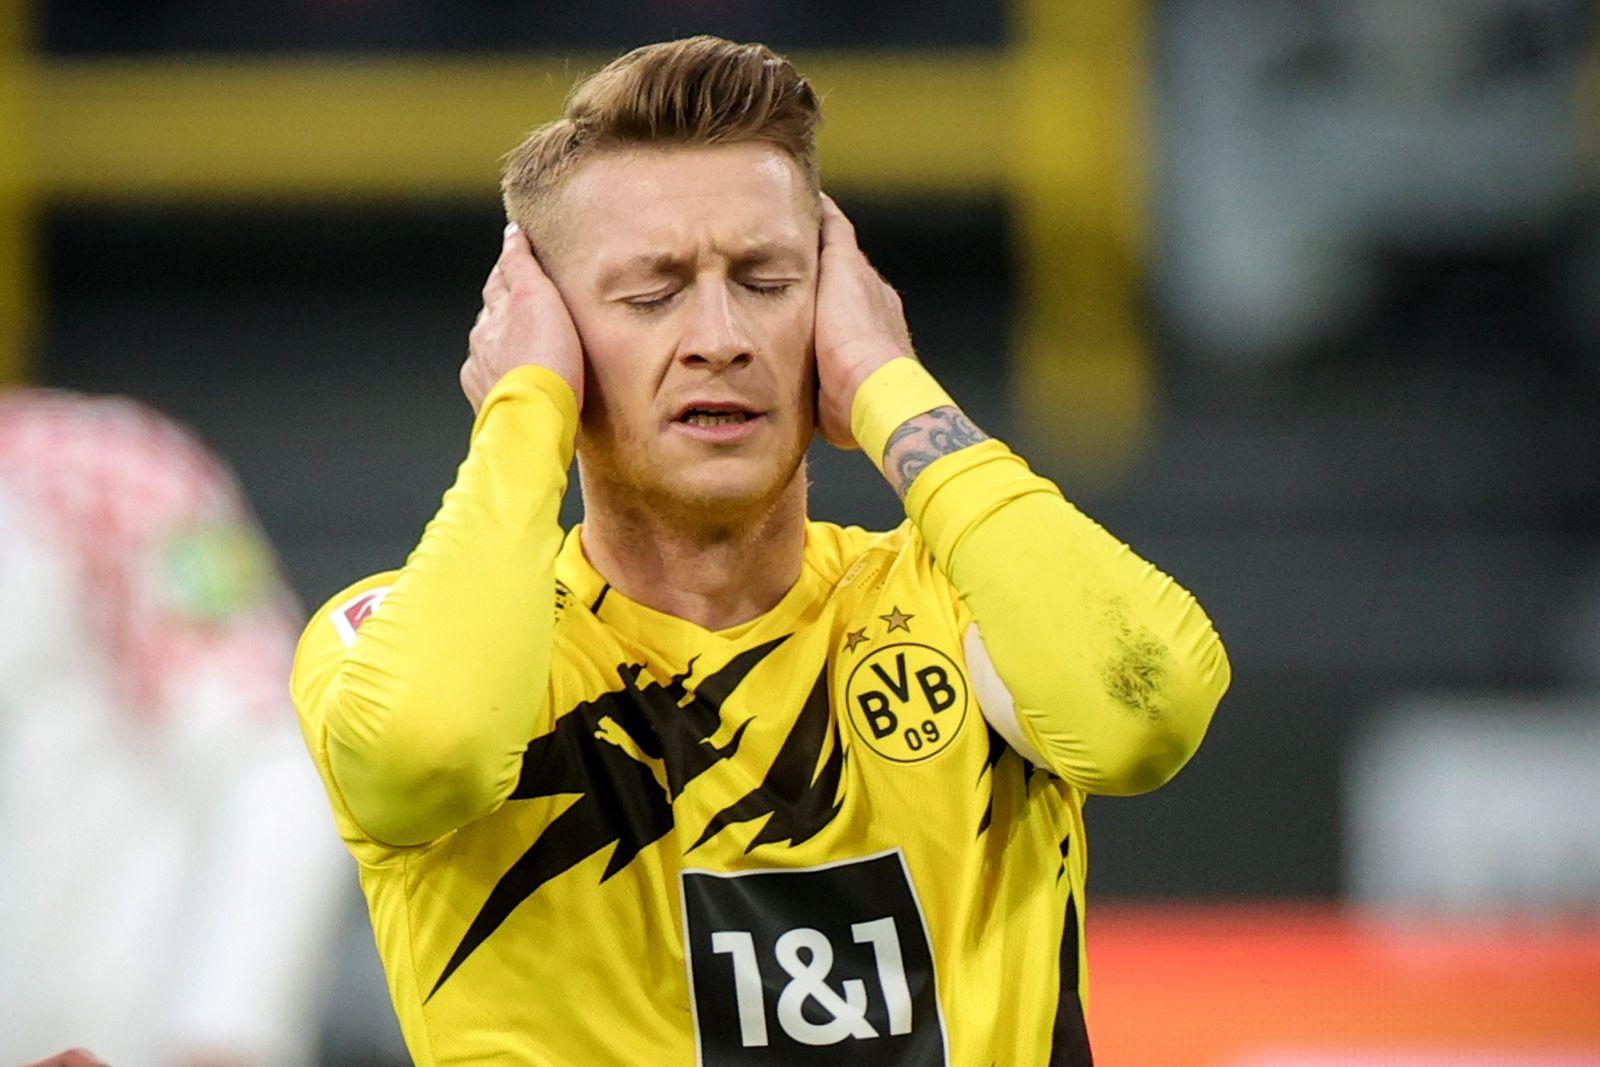 Borussia Dortmund vs 1. FSV Mainz 05, Germany - 16 Jan 2021